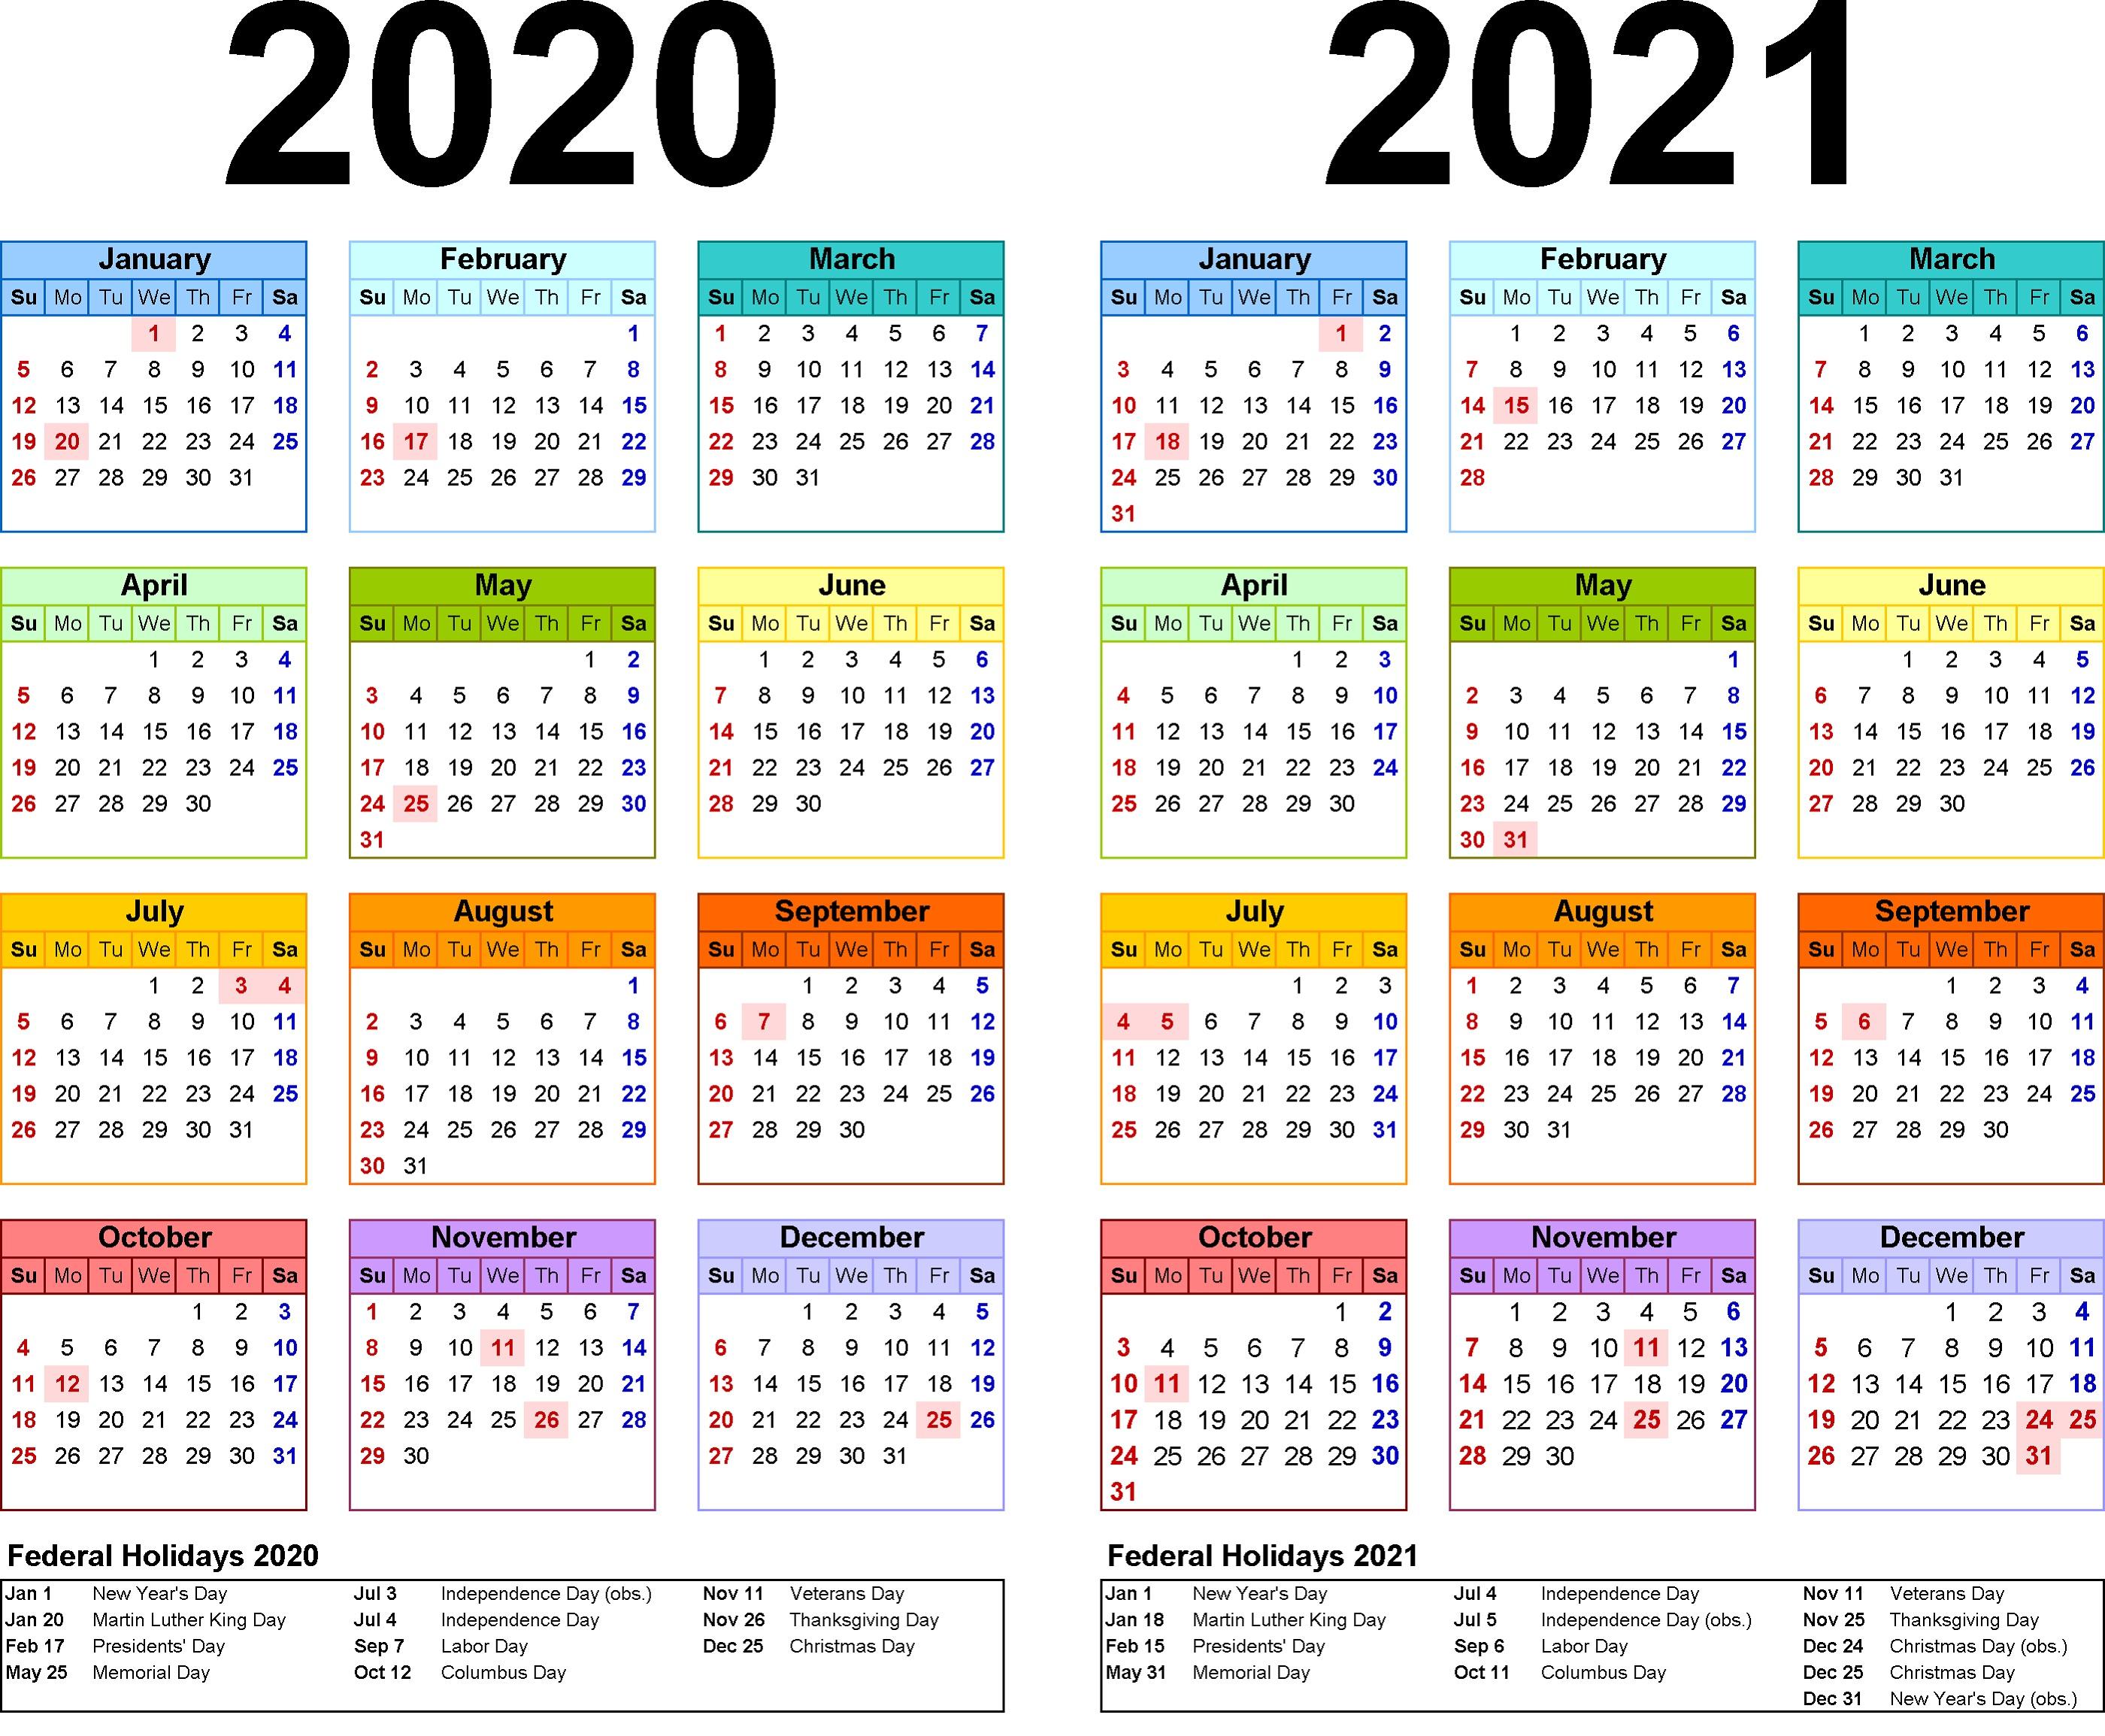 2020 Academic Calendar Template - Wpa.wpart.co with 2 Year Calendar Template 2020 2021